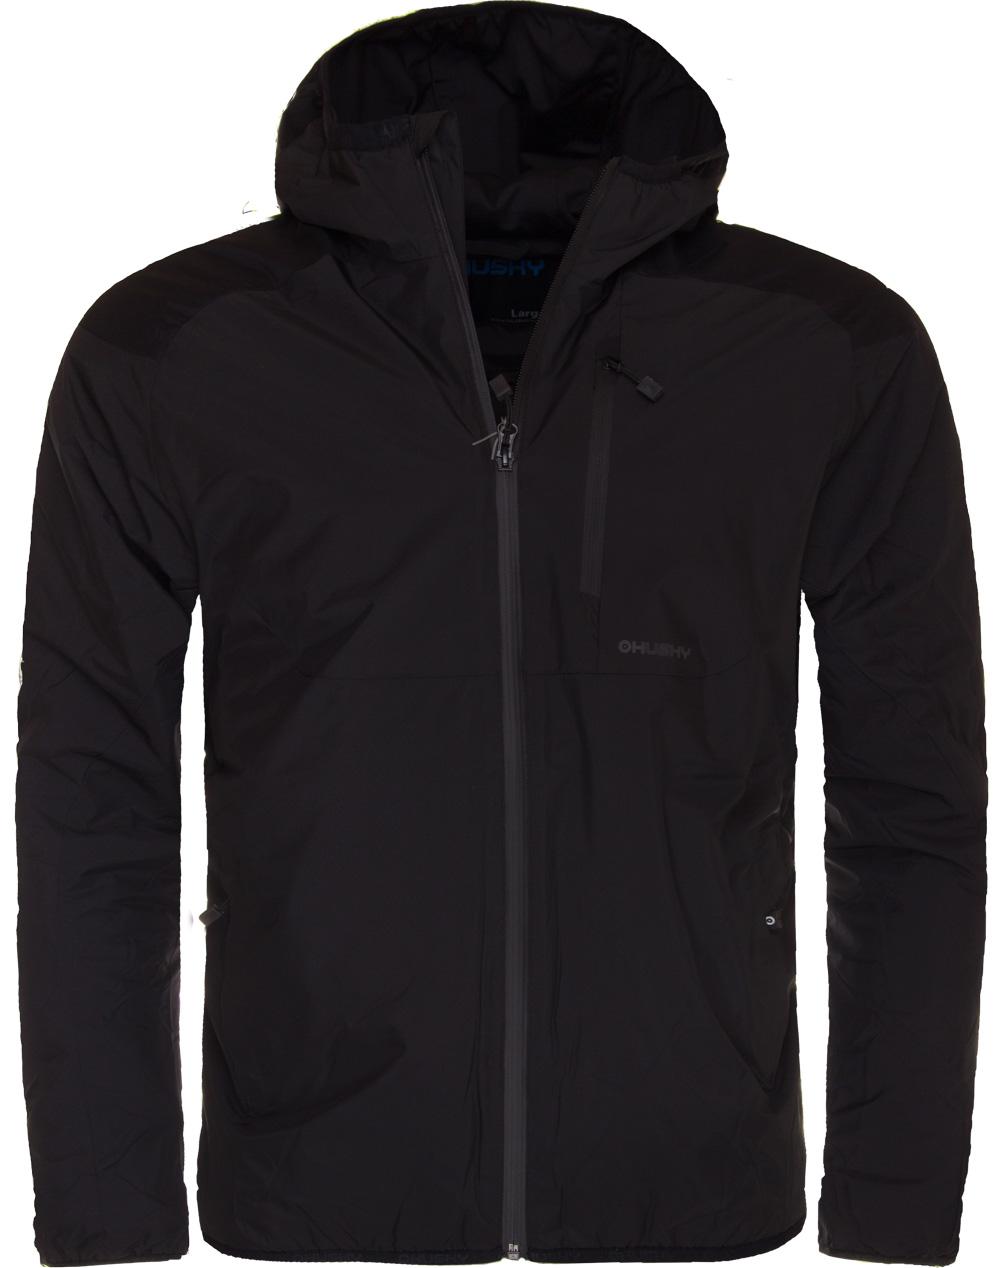 Men's softshell jacket HUSKY NOTT M